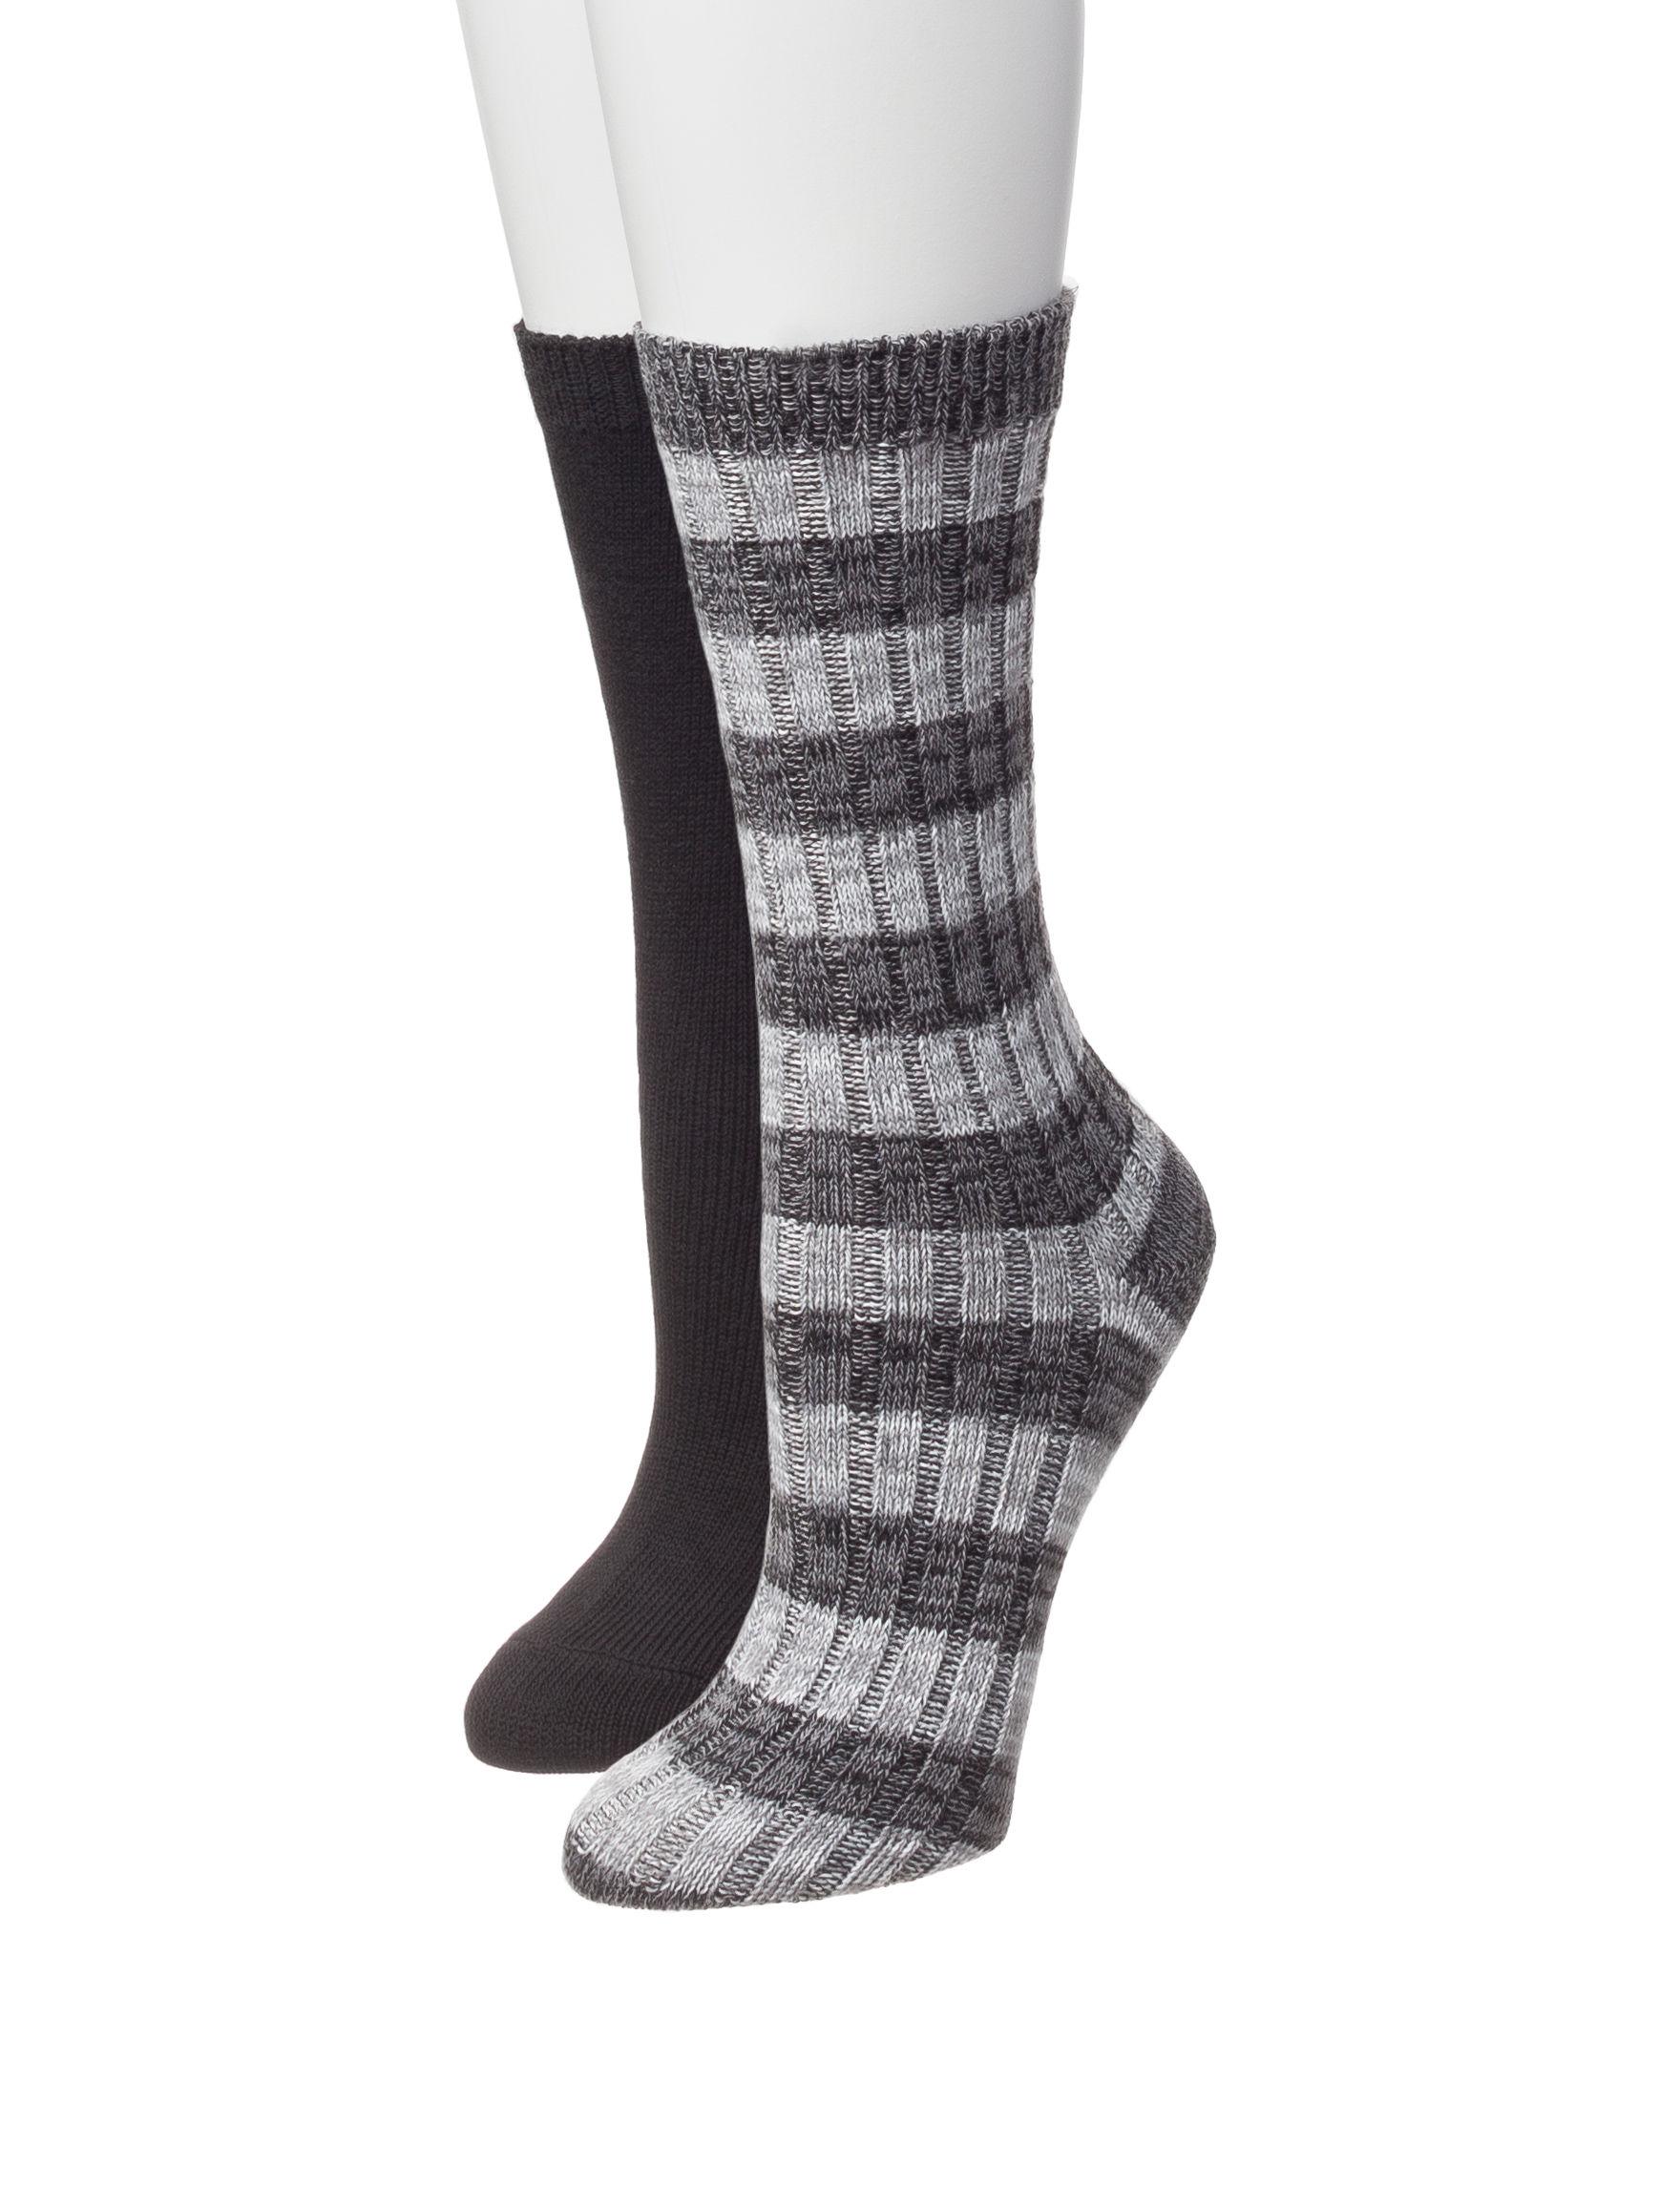 Signature Studio Grey Socks